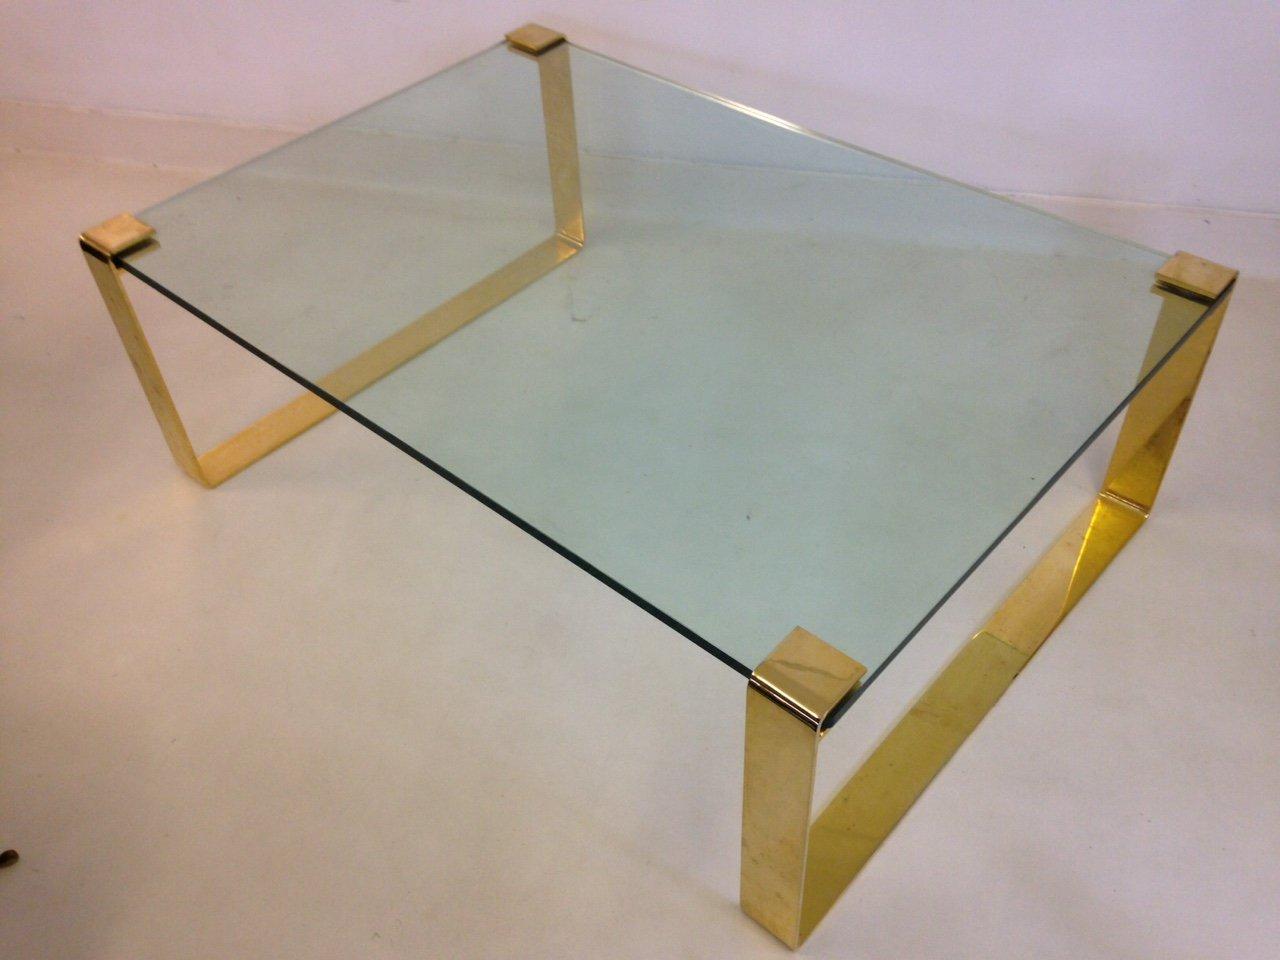 goldener vintage metal glas couchtisch bei pamono kaufen. Black Bedroom Furniture Sets. Home Design Ideas